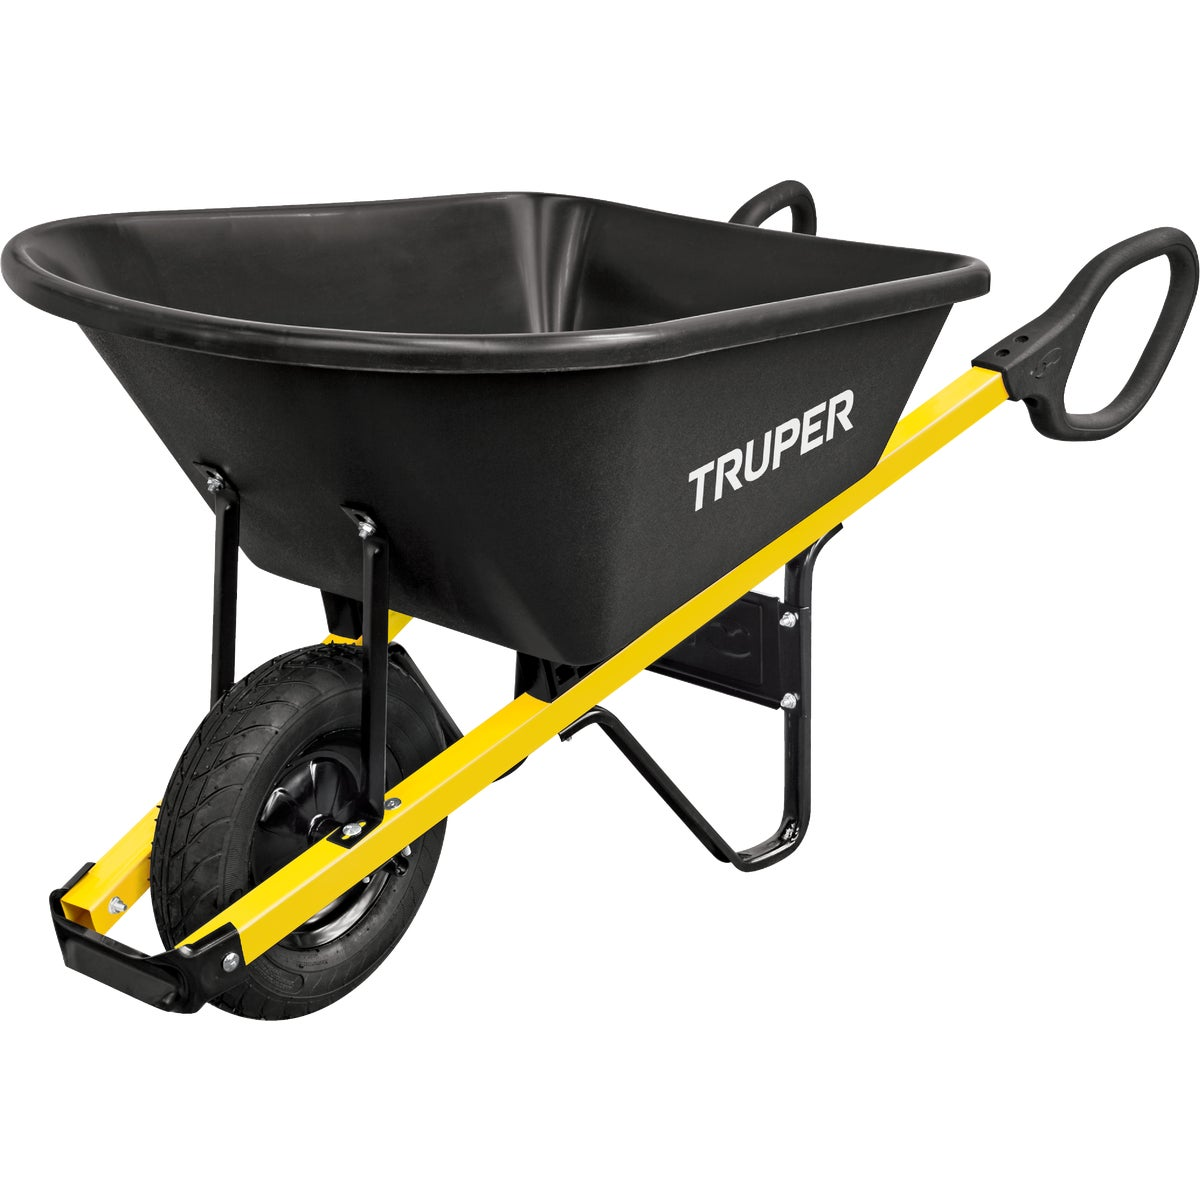 Truper Tru Grip Landscaper Poly Wheelbarrow, TP6-GR